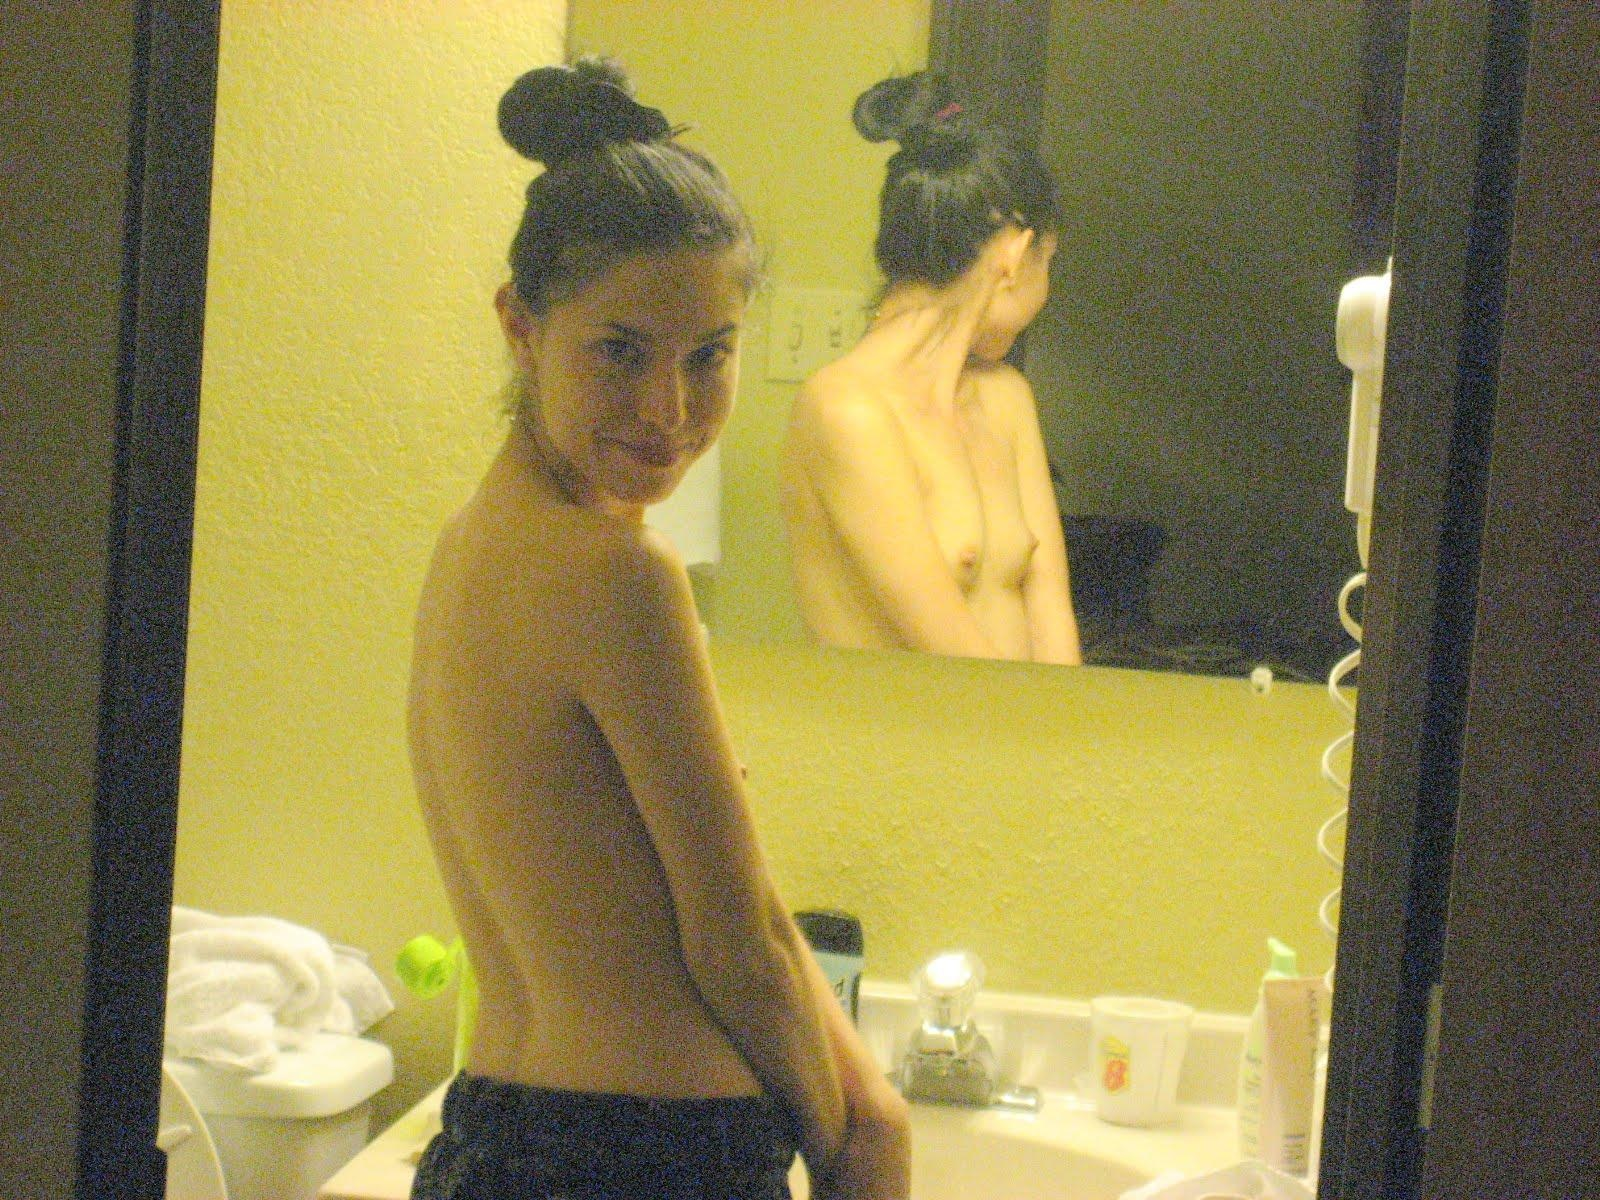 Bathroom latina naked pics agree, the